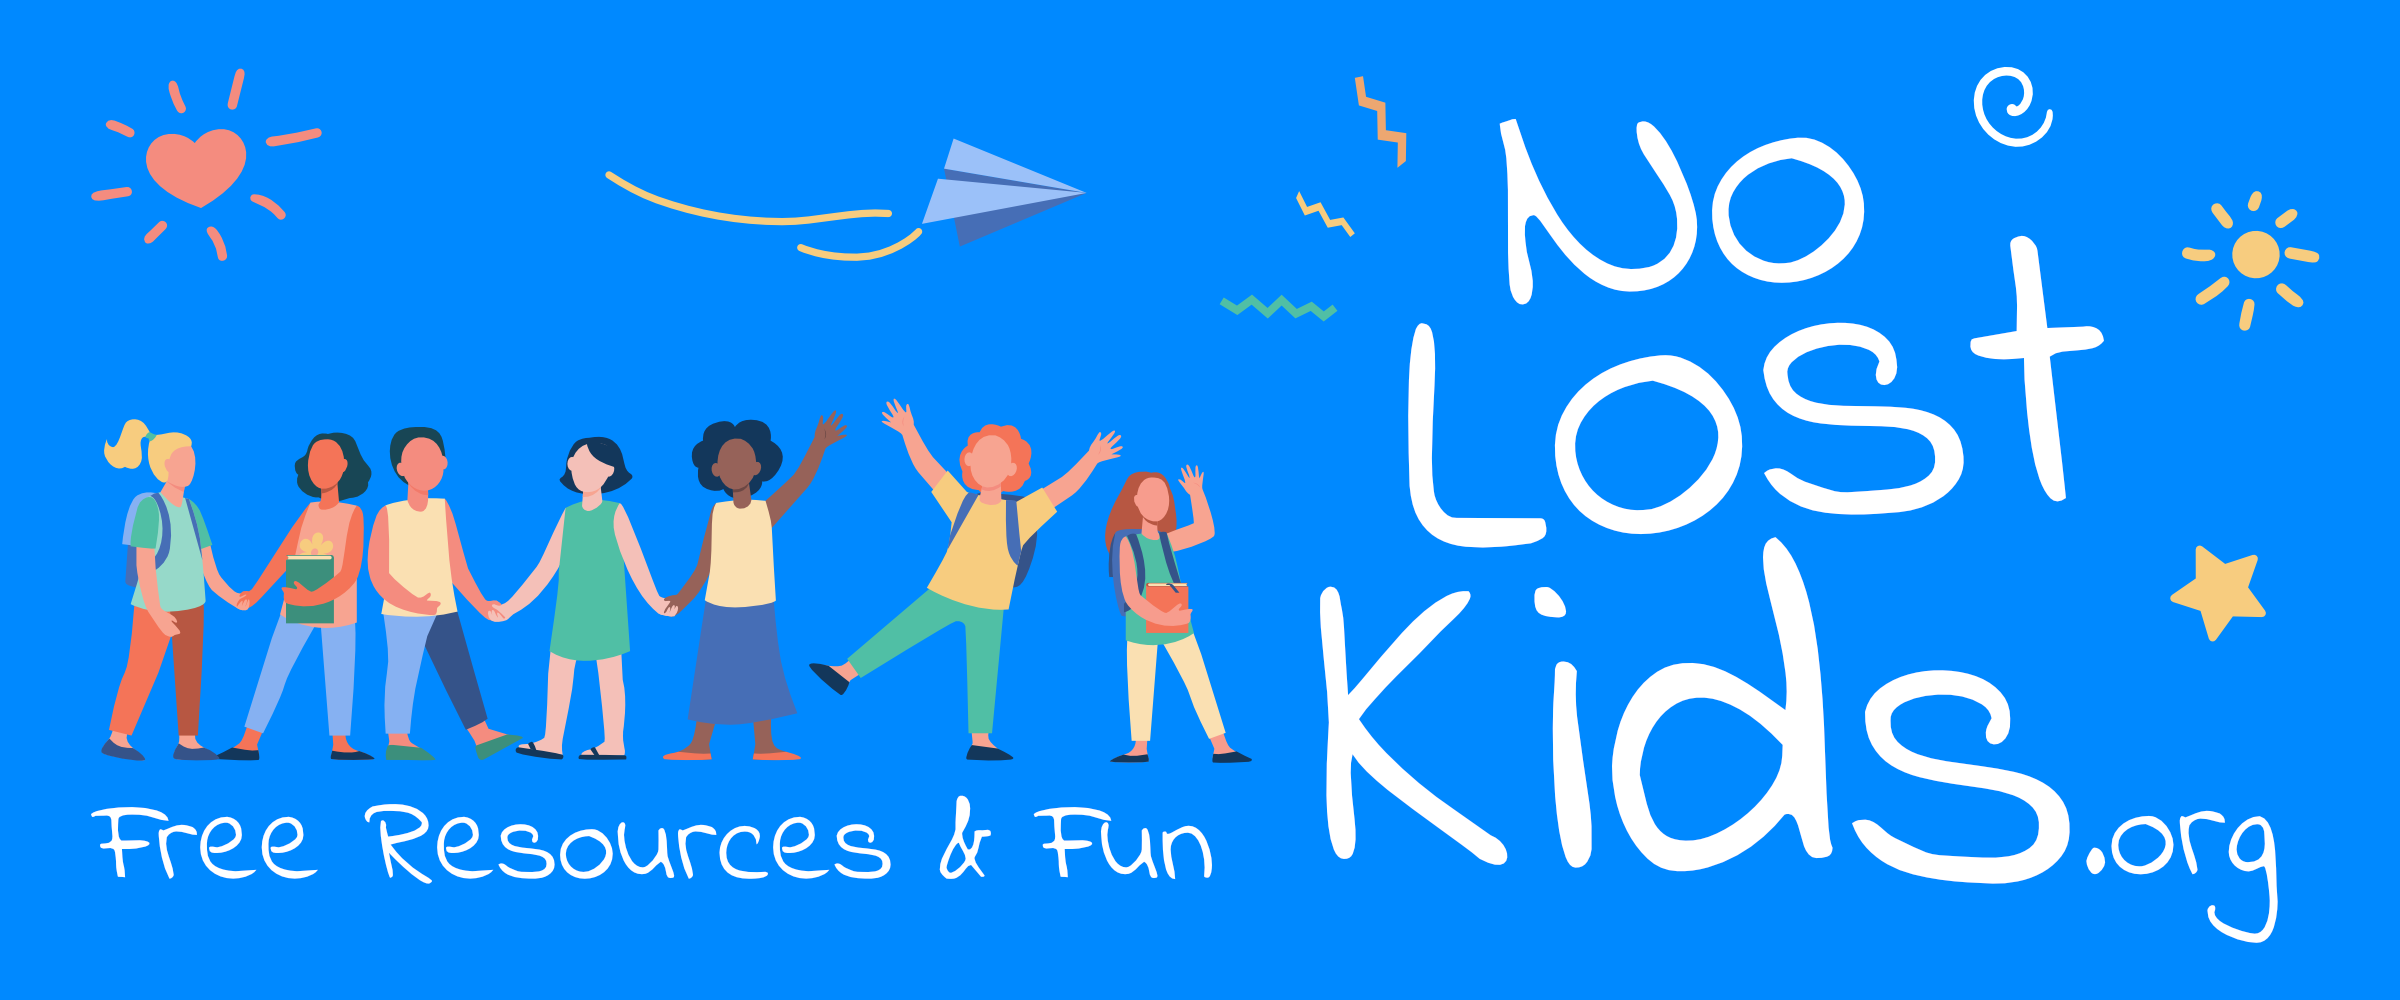 No Lost Kids.org | Free Resources & Fun